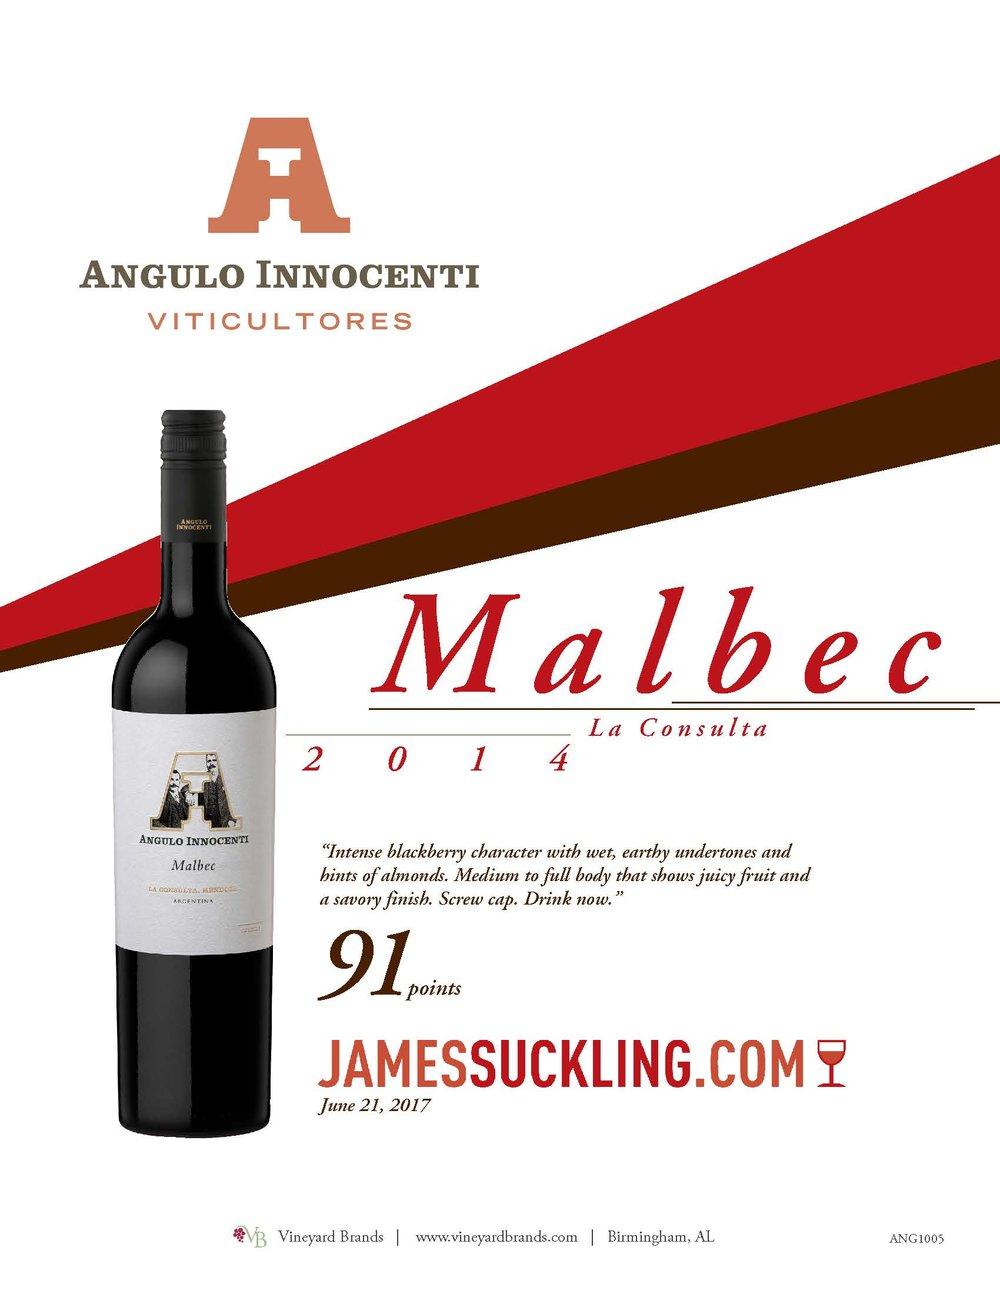 Angulo Innocenti Malbec 2014.jpg